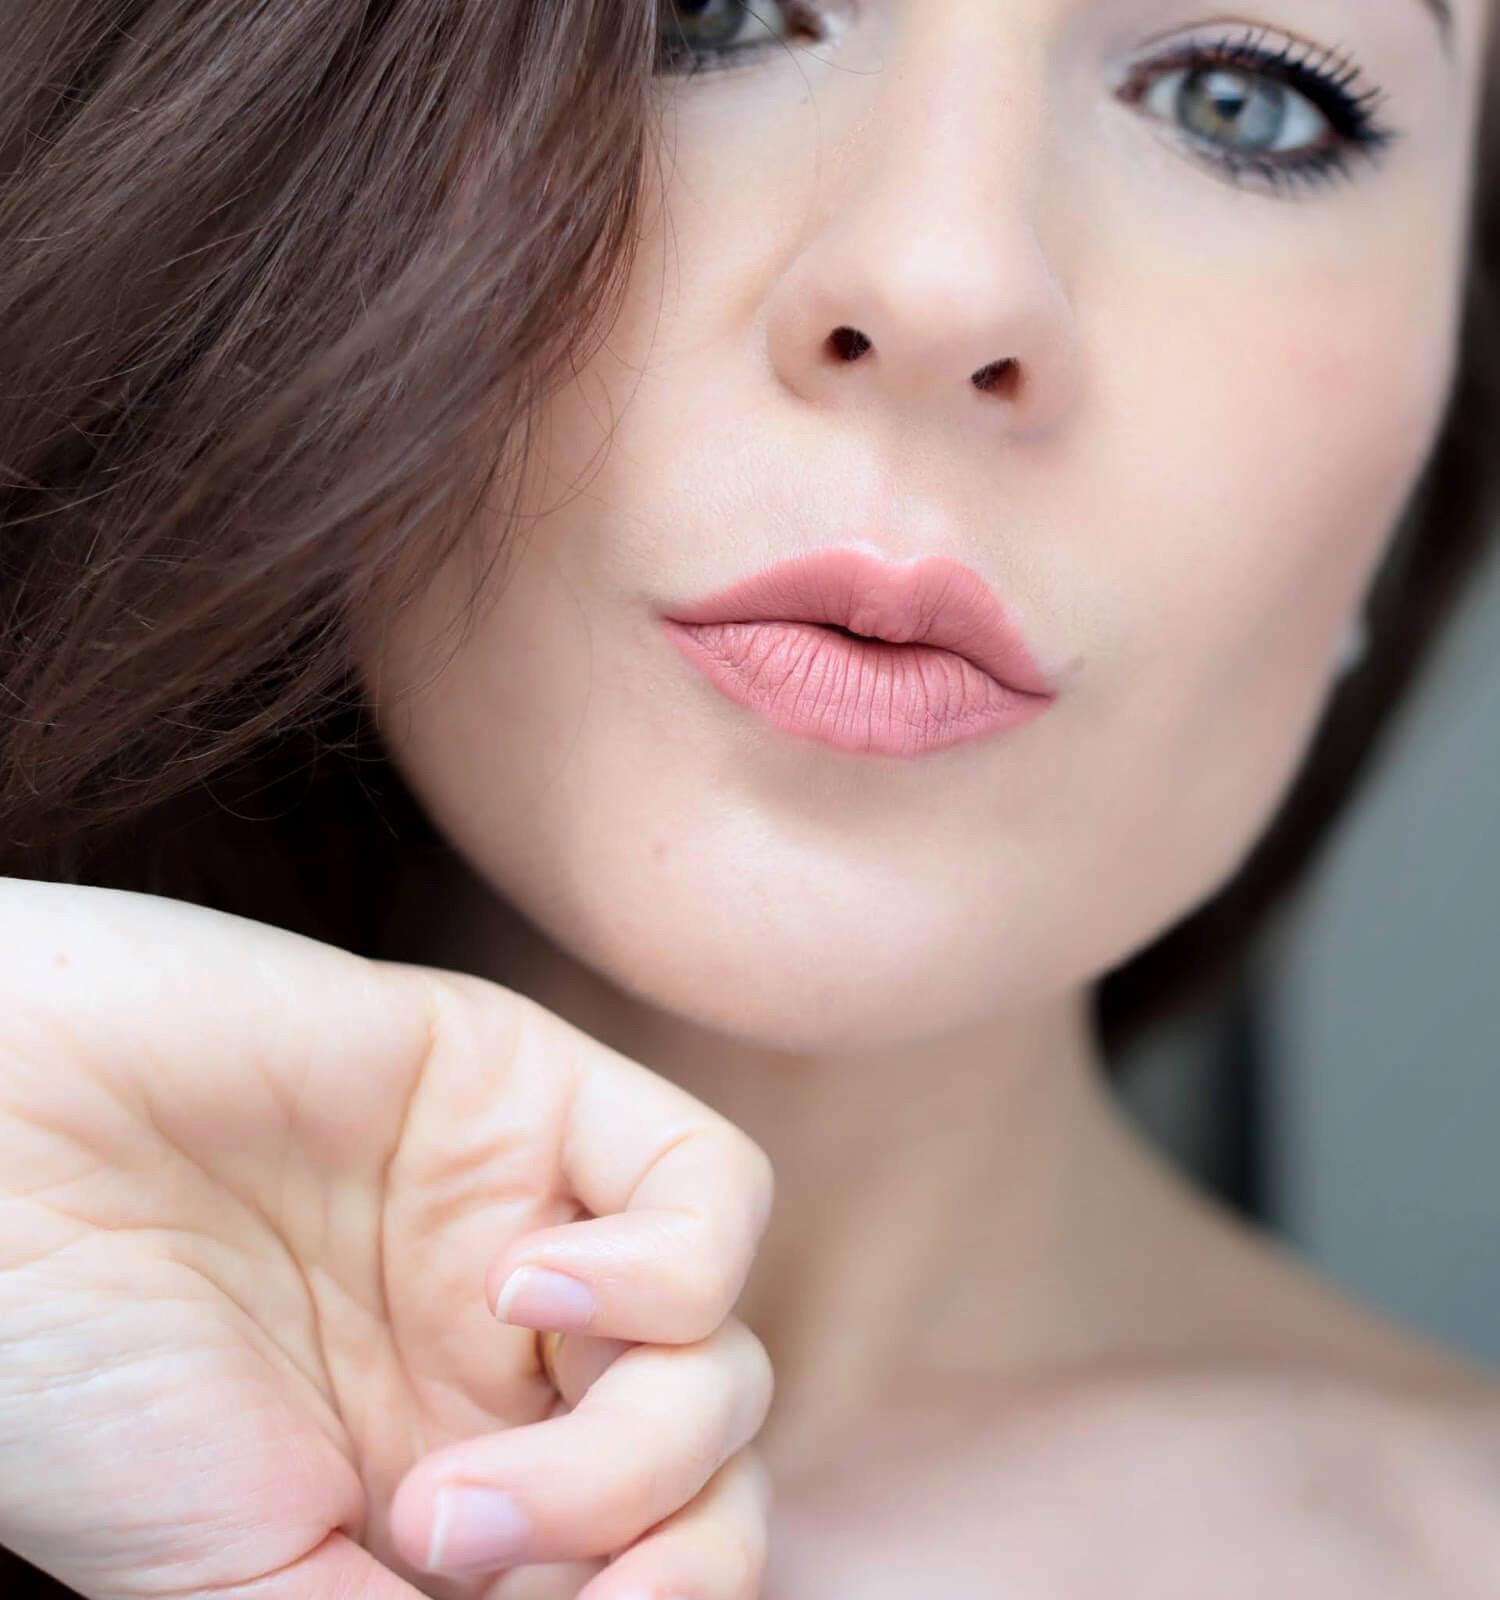 Korres Morello Matte 06 Romantic Nude test